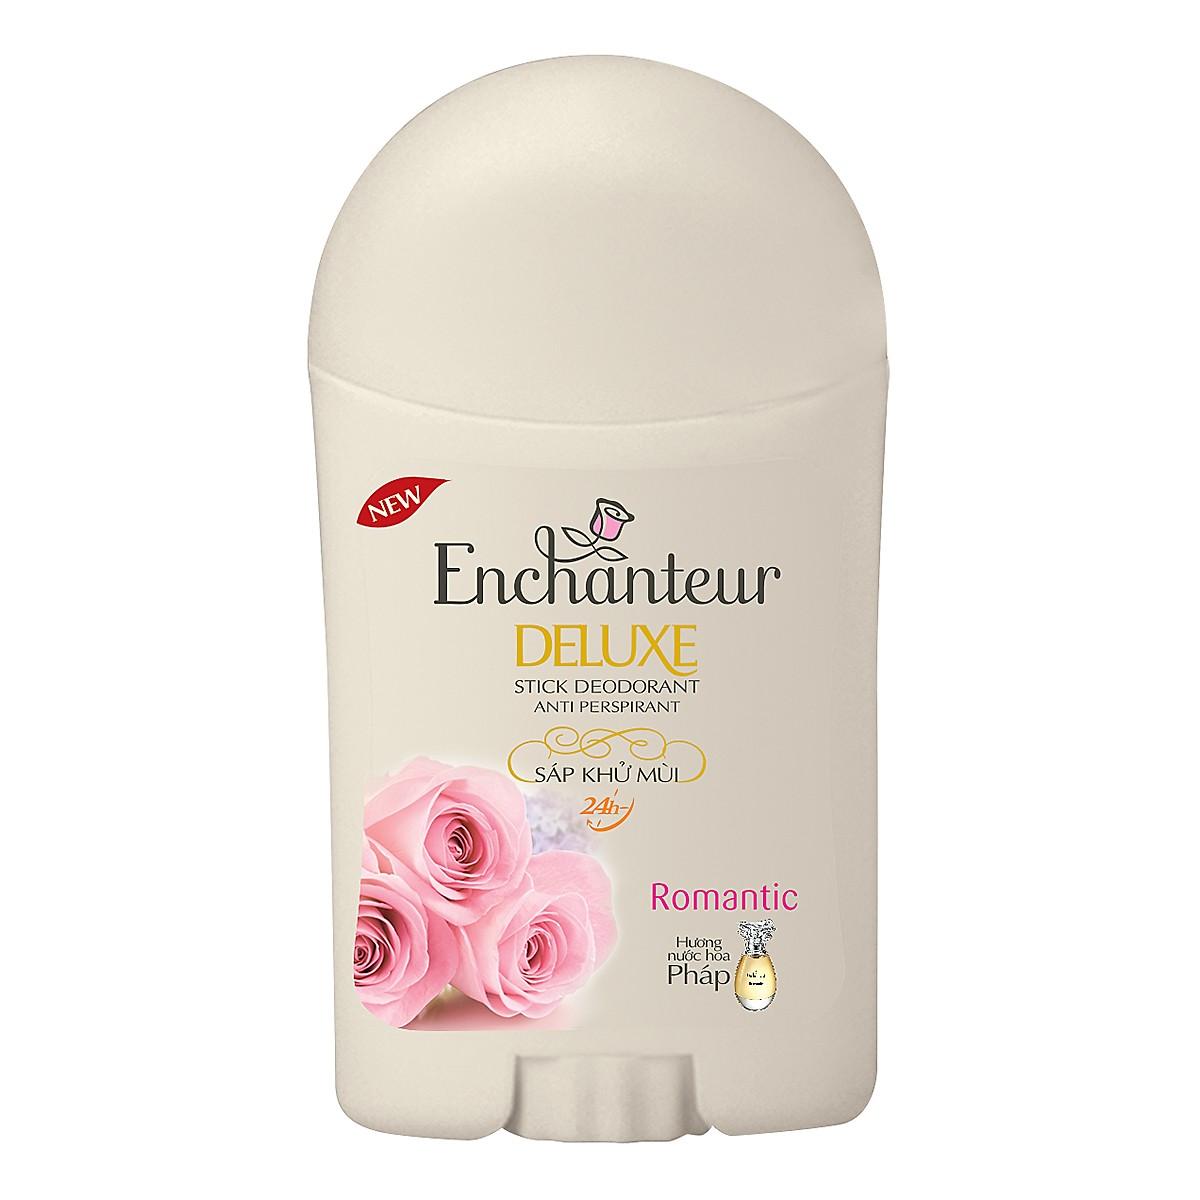 Sáp khử mùi Enchanteur Romantic 40g